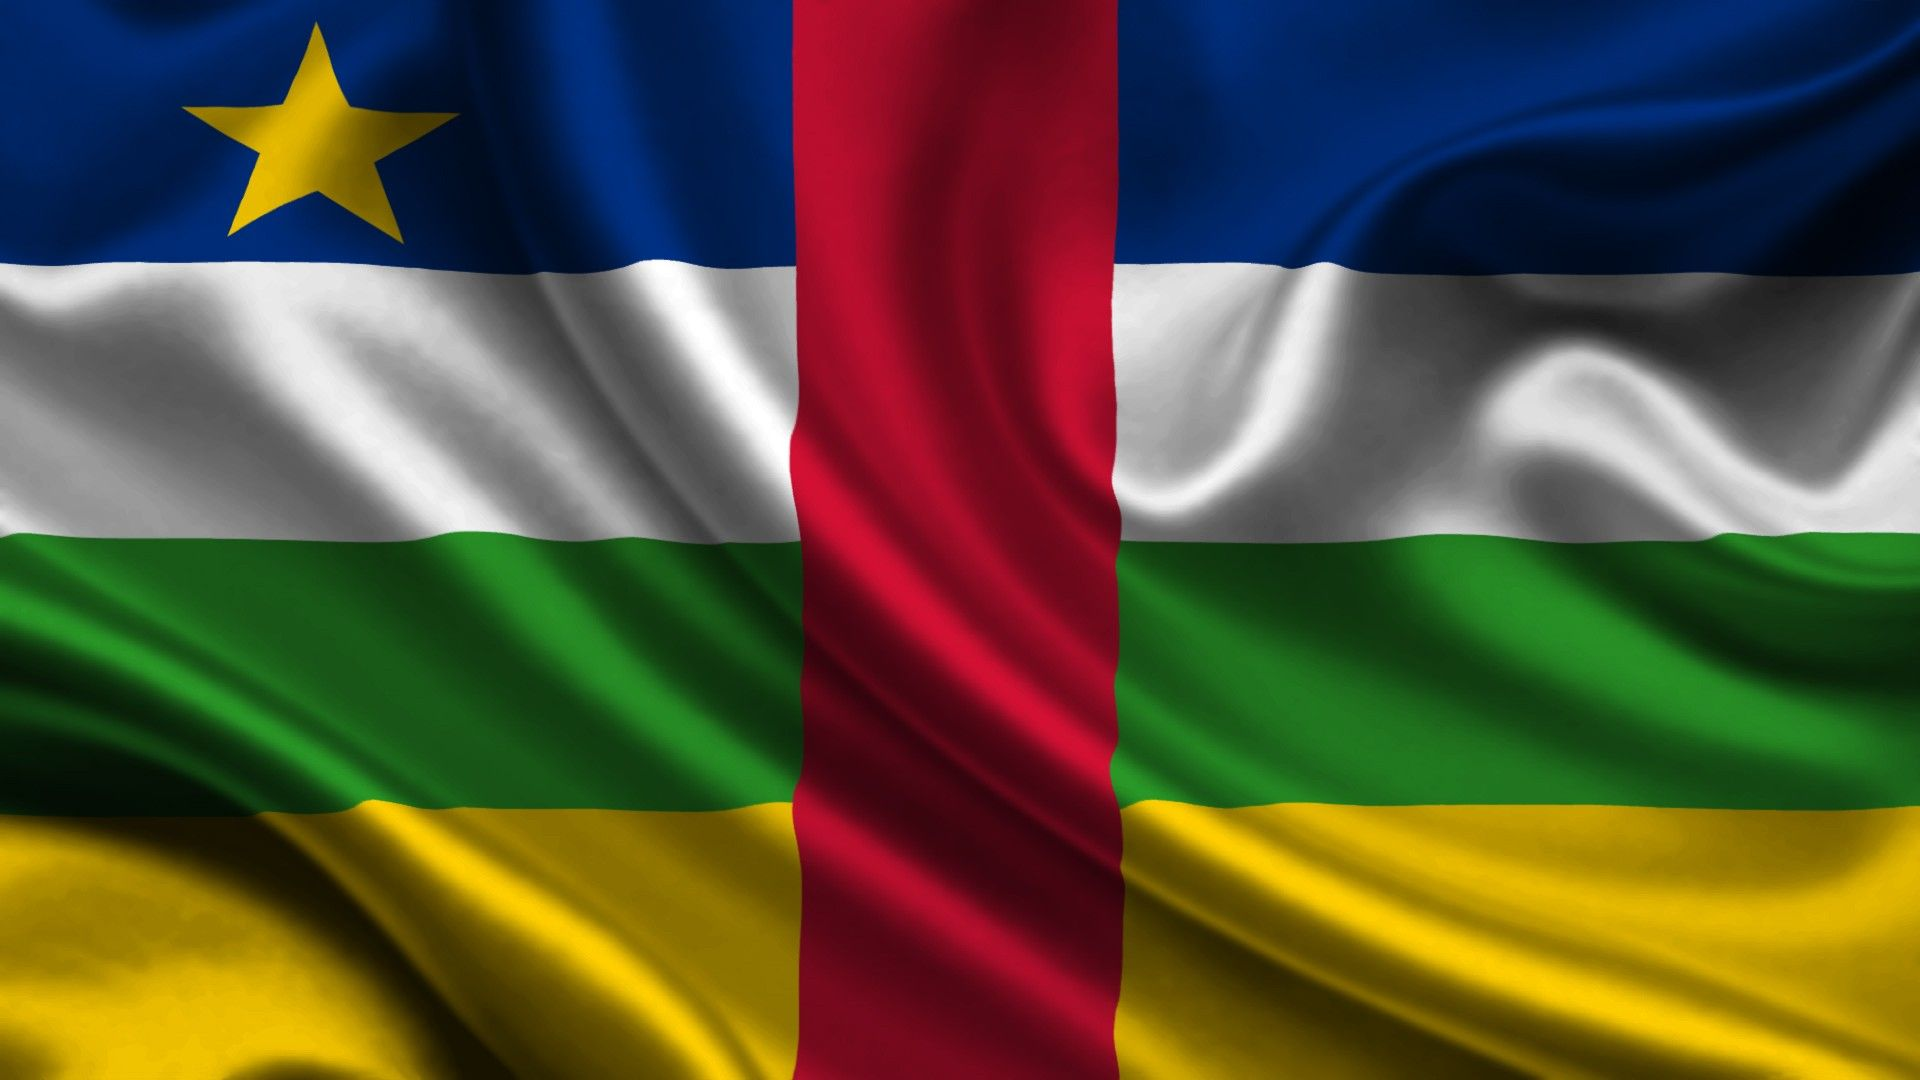 Central African Republic flag wallpaper Flags wallpaper 1920x1080